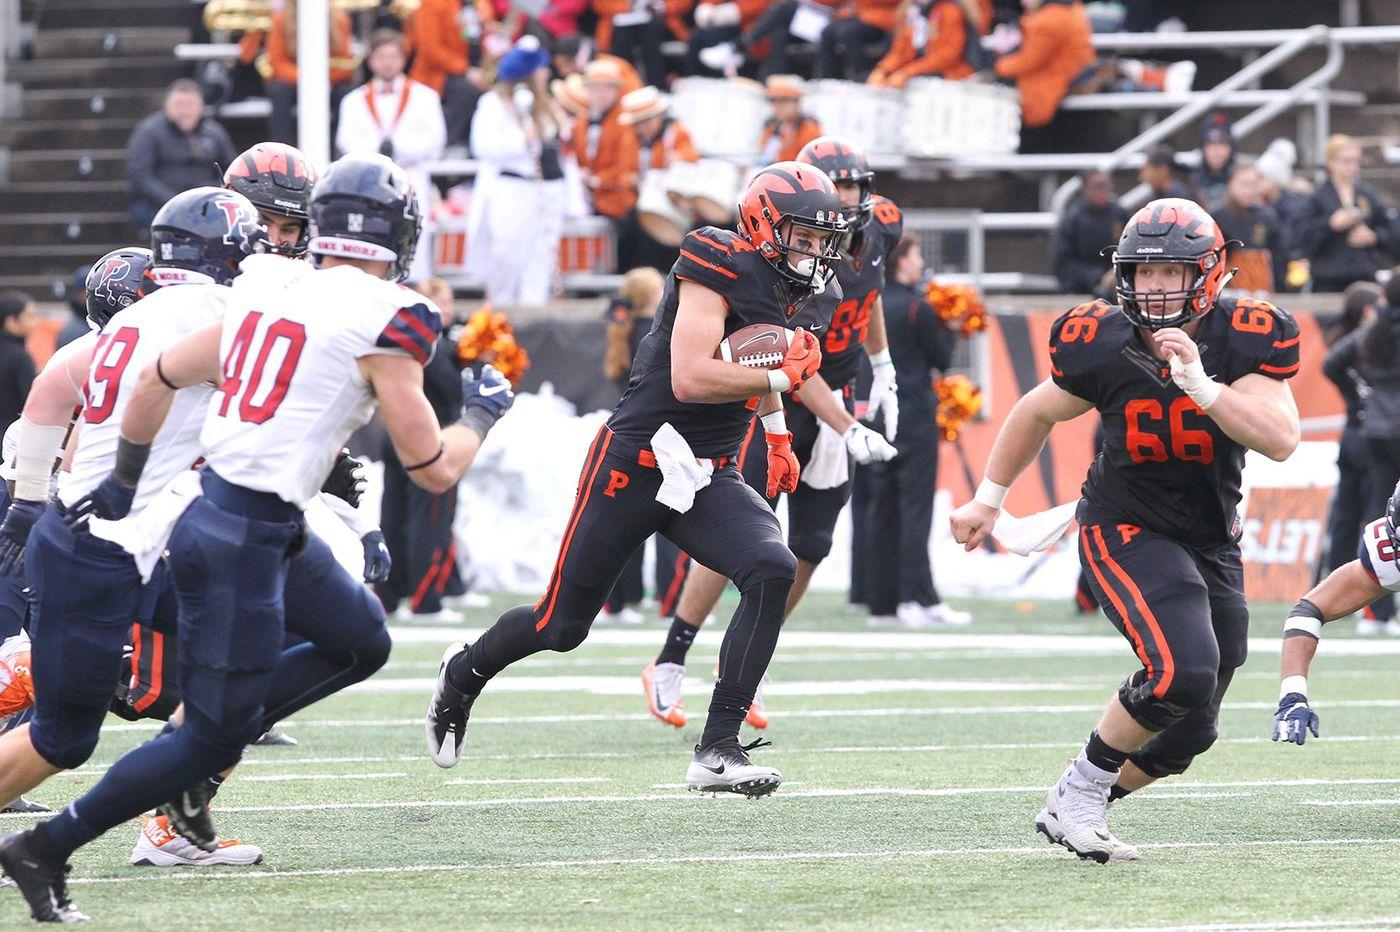 Penn football season ends with 42-14 loss to Ivy League champion Princeton